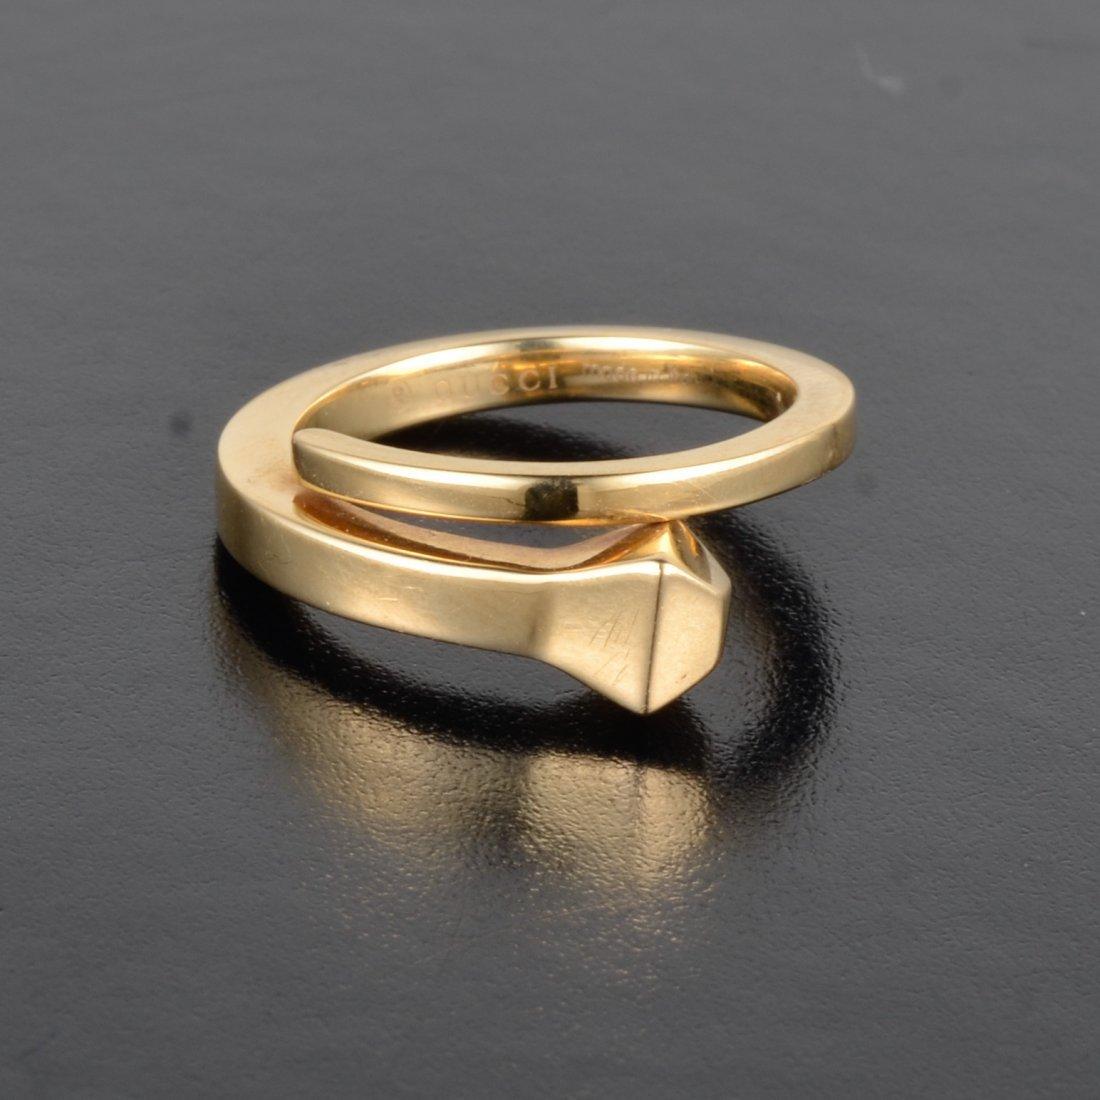 Gucci gold nail style ring